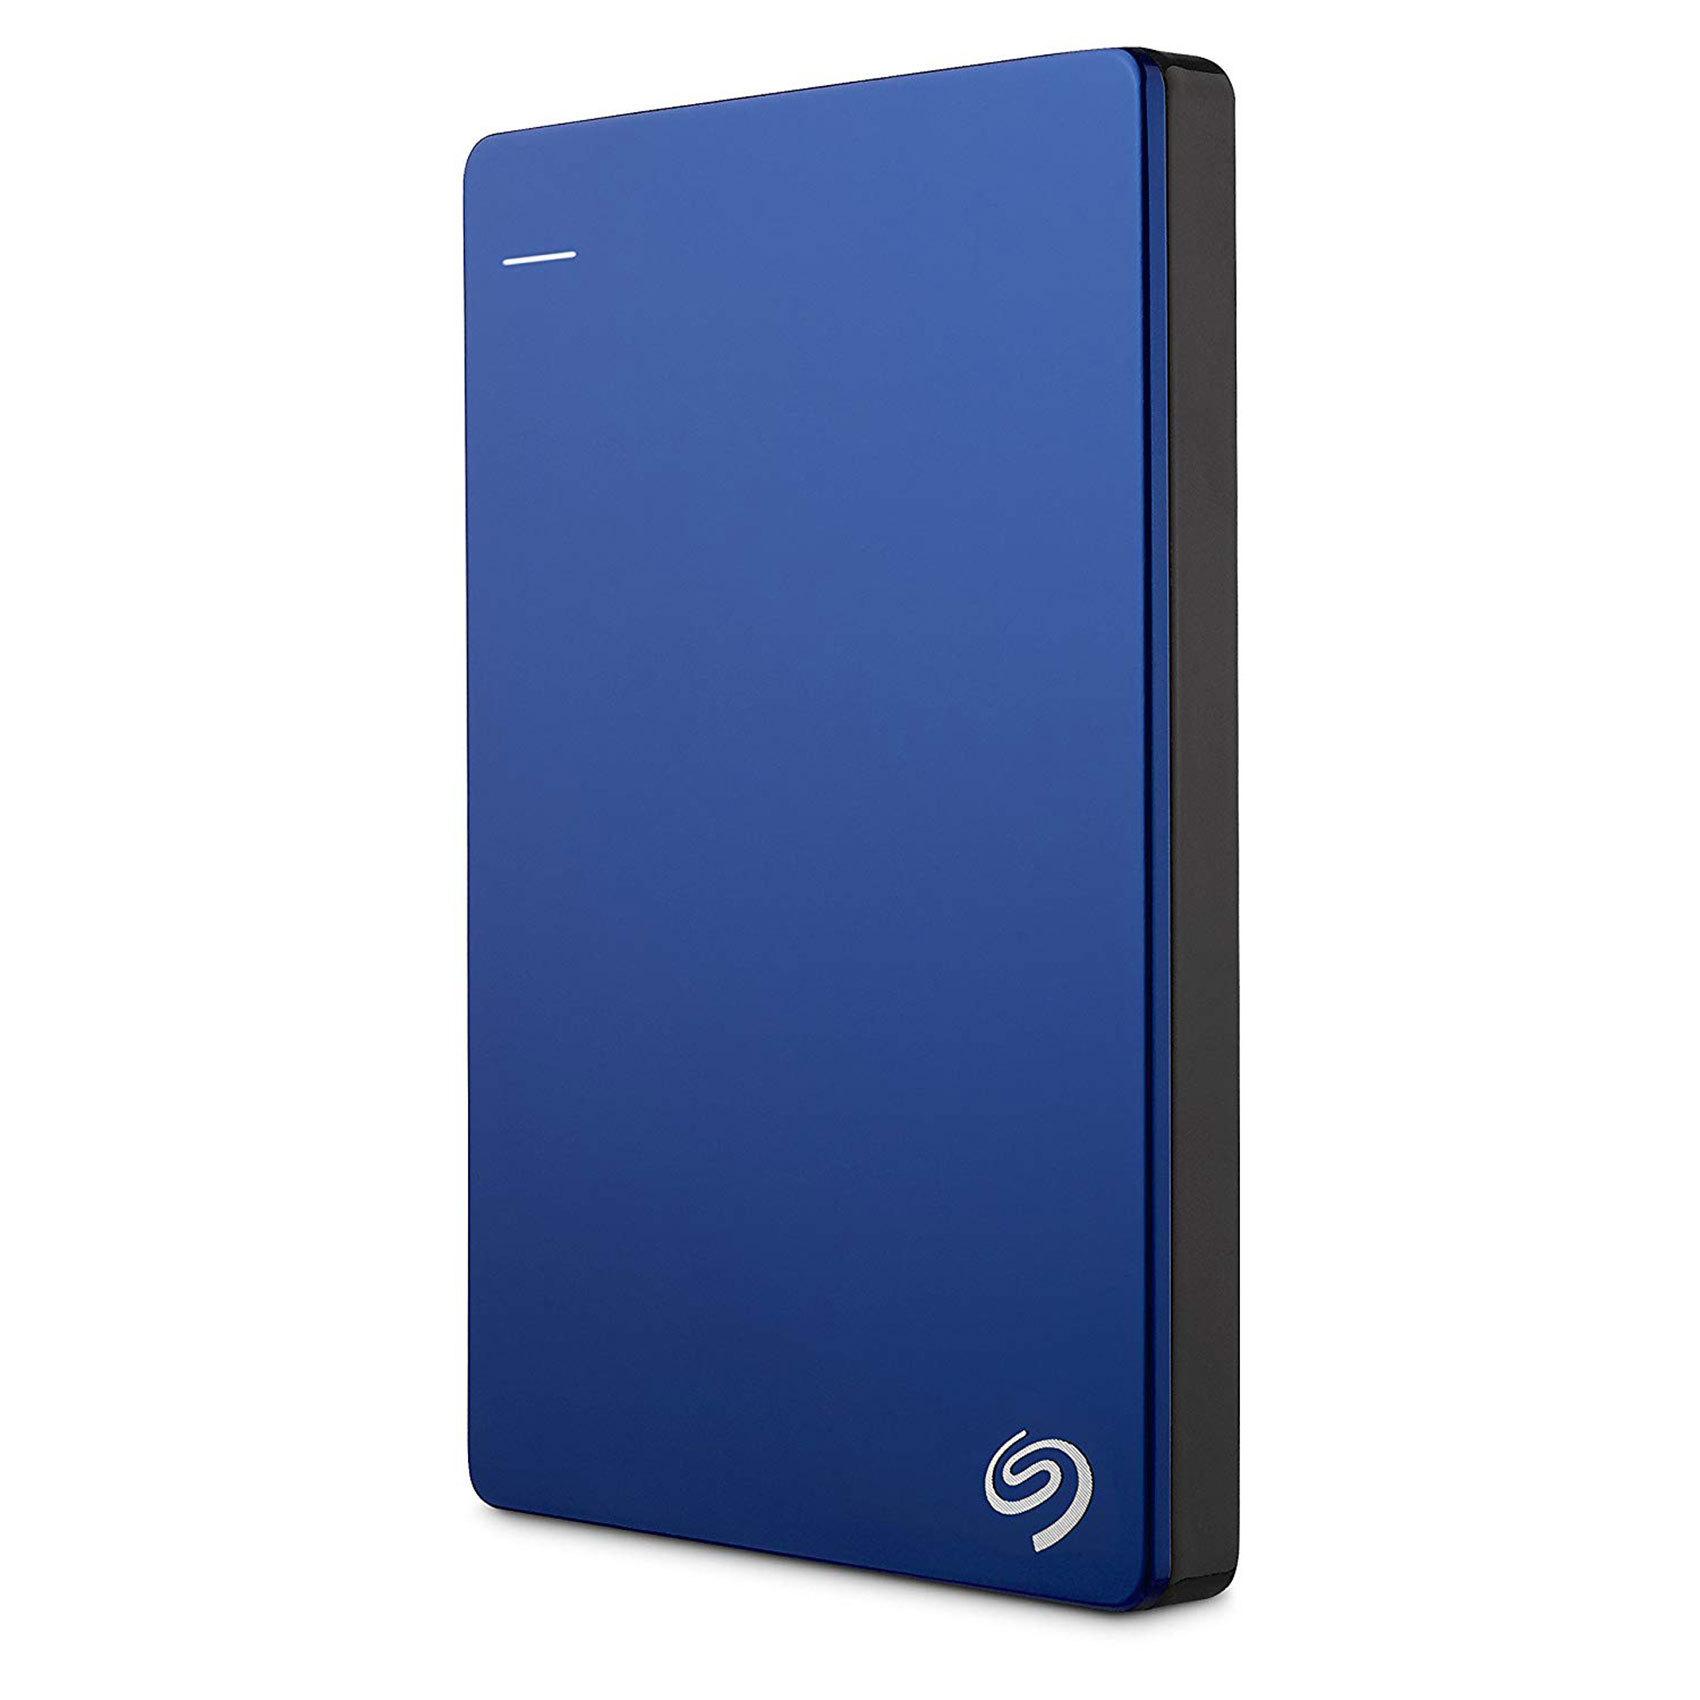 SEAGATE HDD 2TB BKUP+PORT SLIM BLU